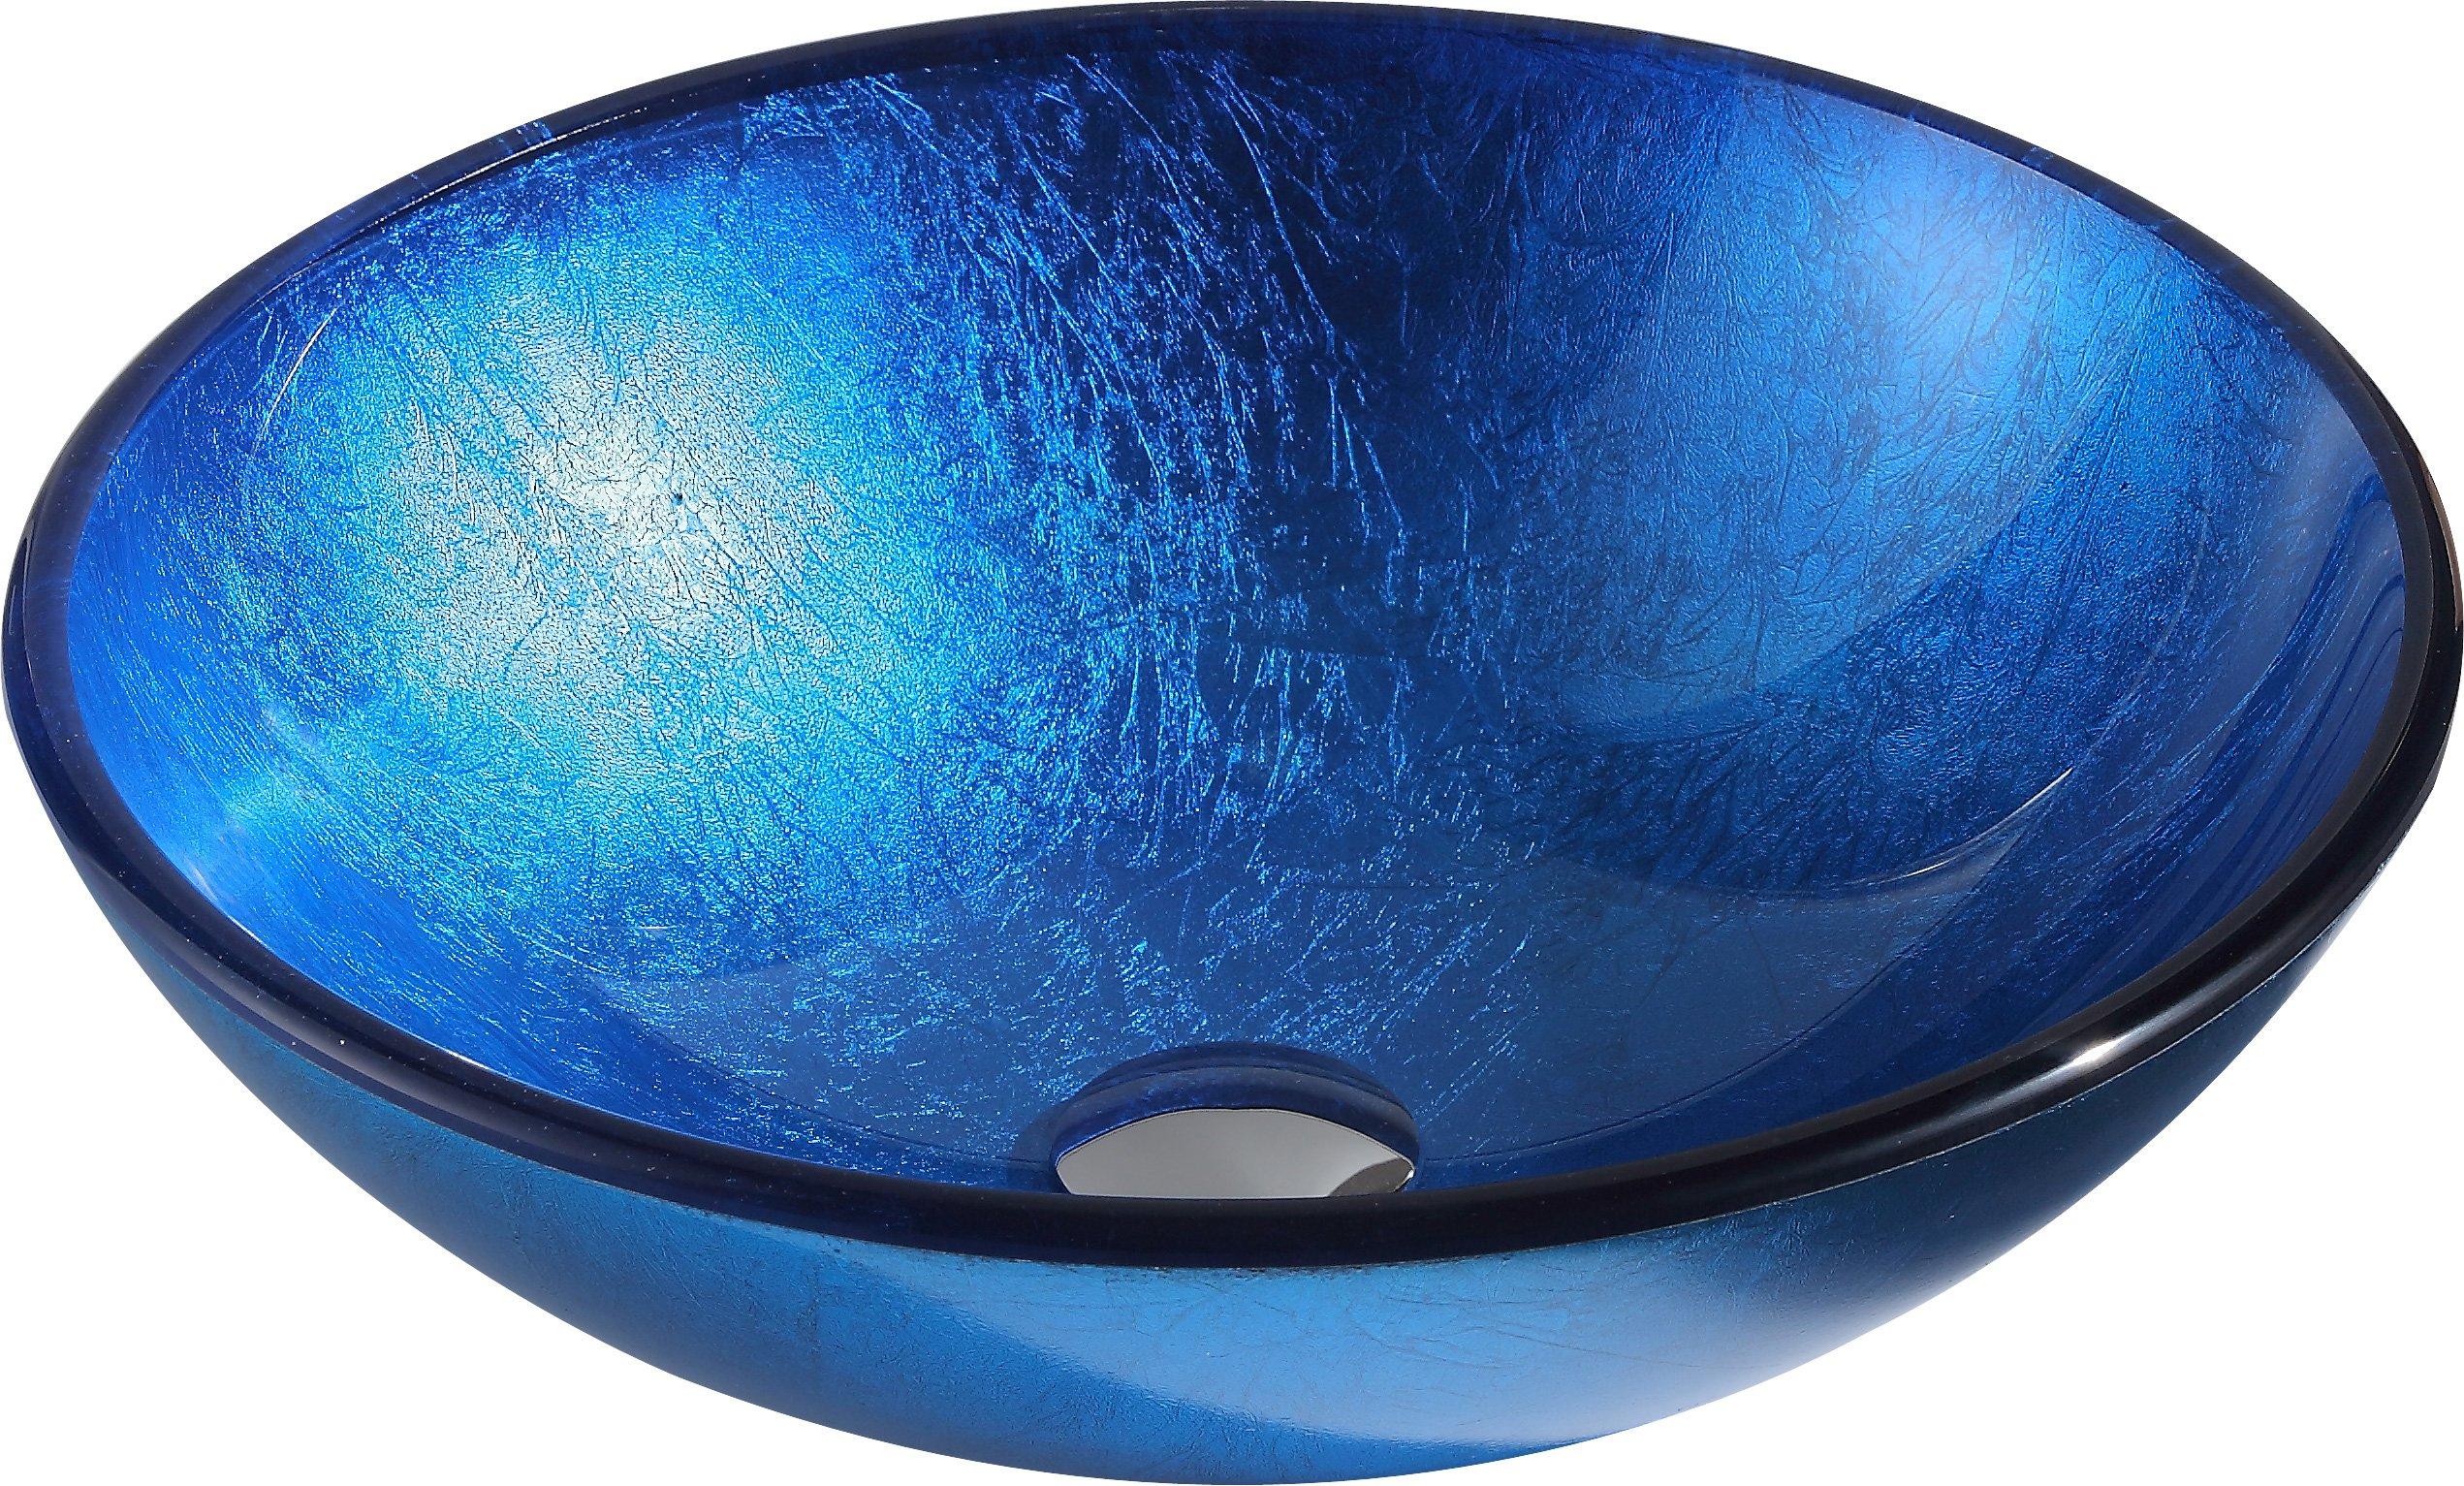 Tempered Glass Vessel Sink - Lustrous Blue - Clavier Series LS-AZ027 - ANZZI